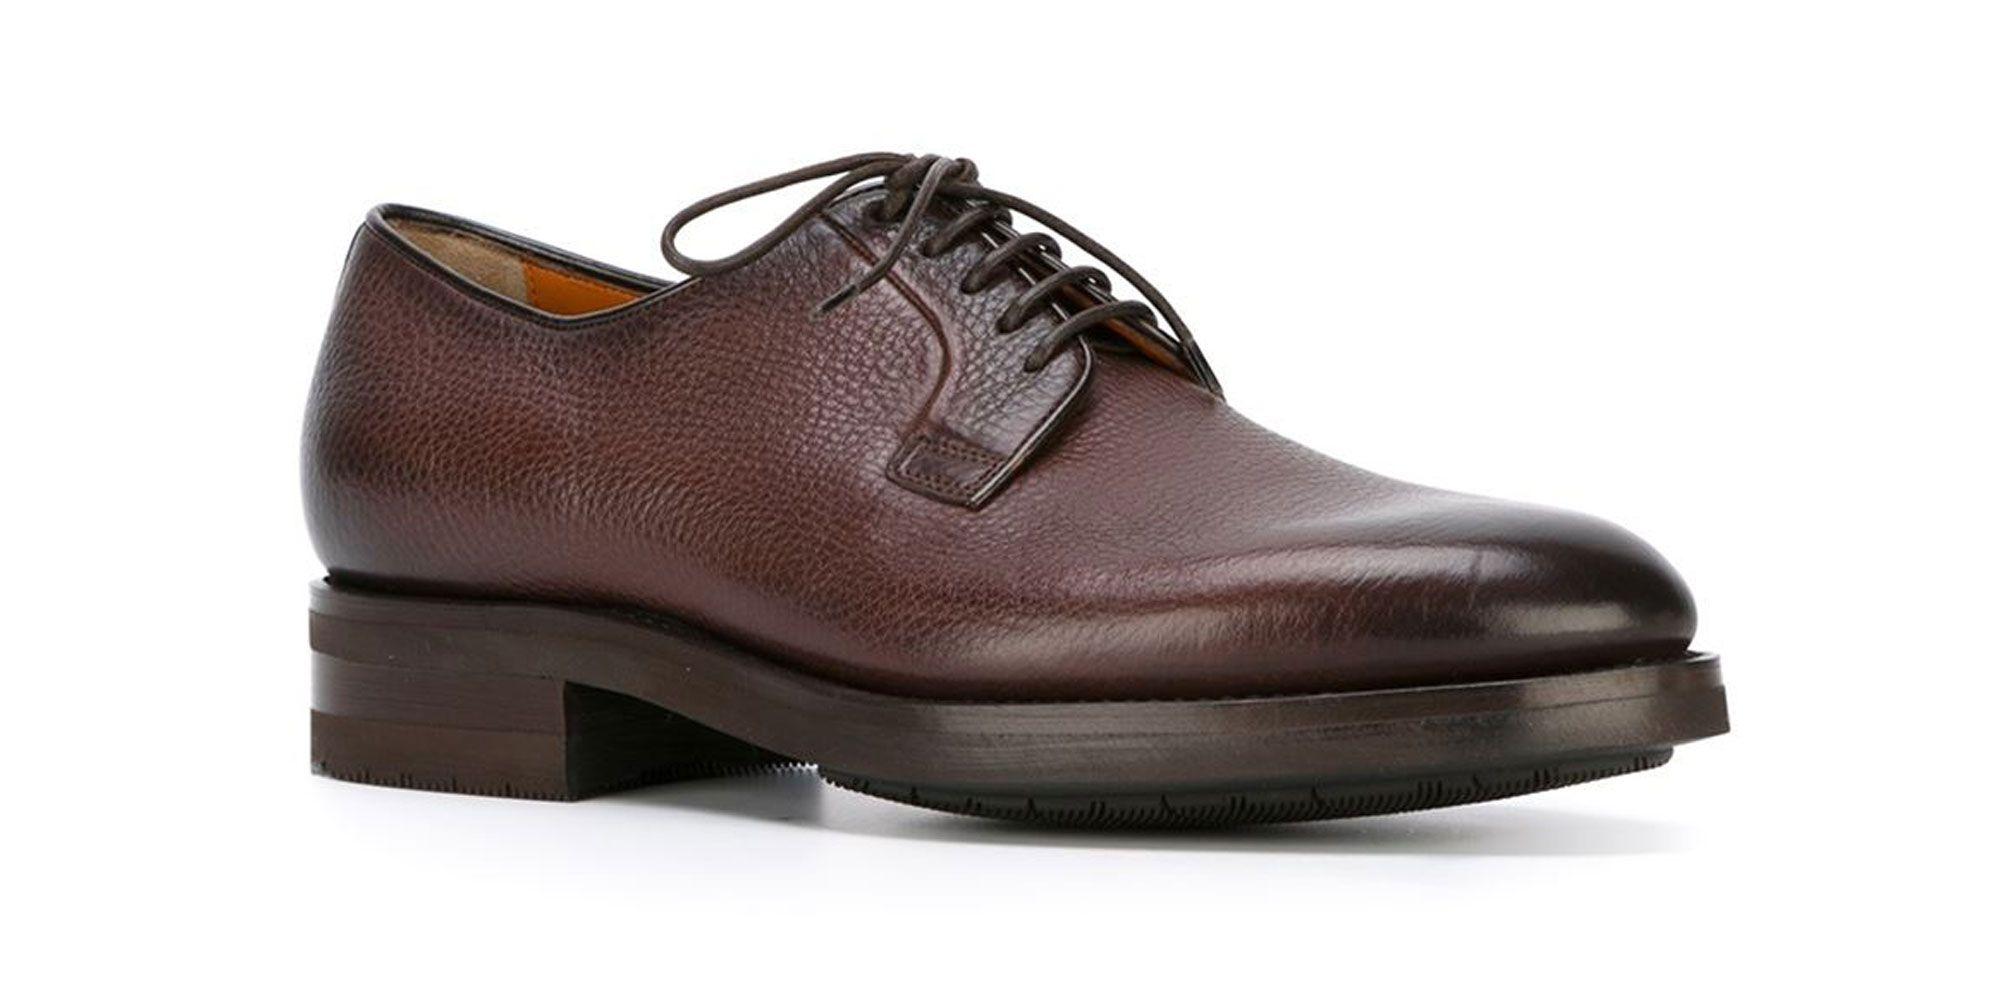 Footwear Fix: Santoni Burnished Derby Shoes